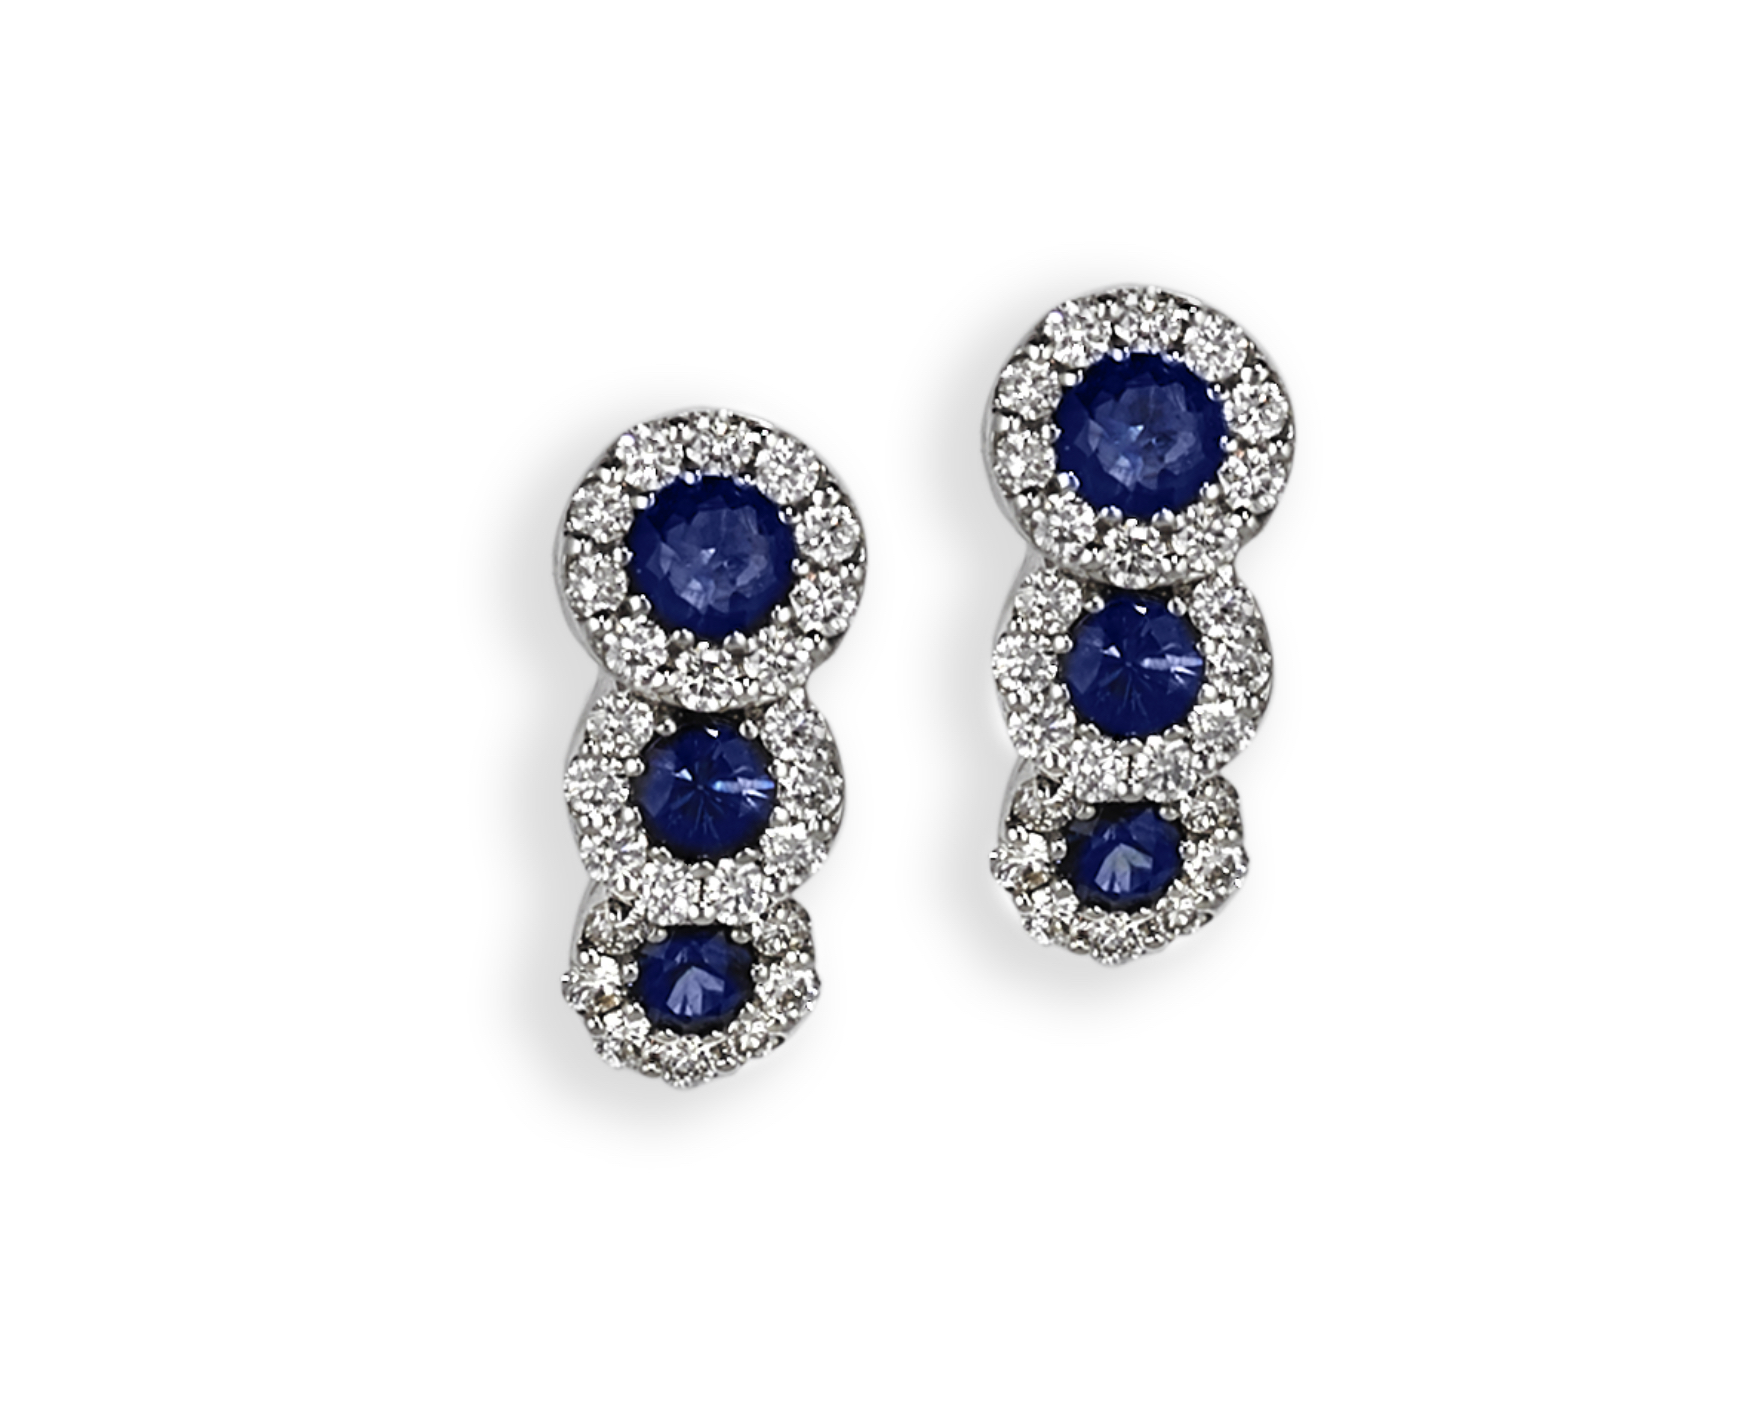 18ct White Gold Sapphire